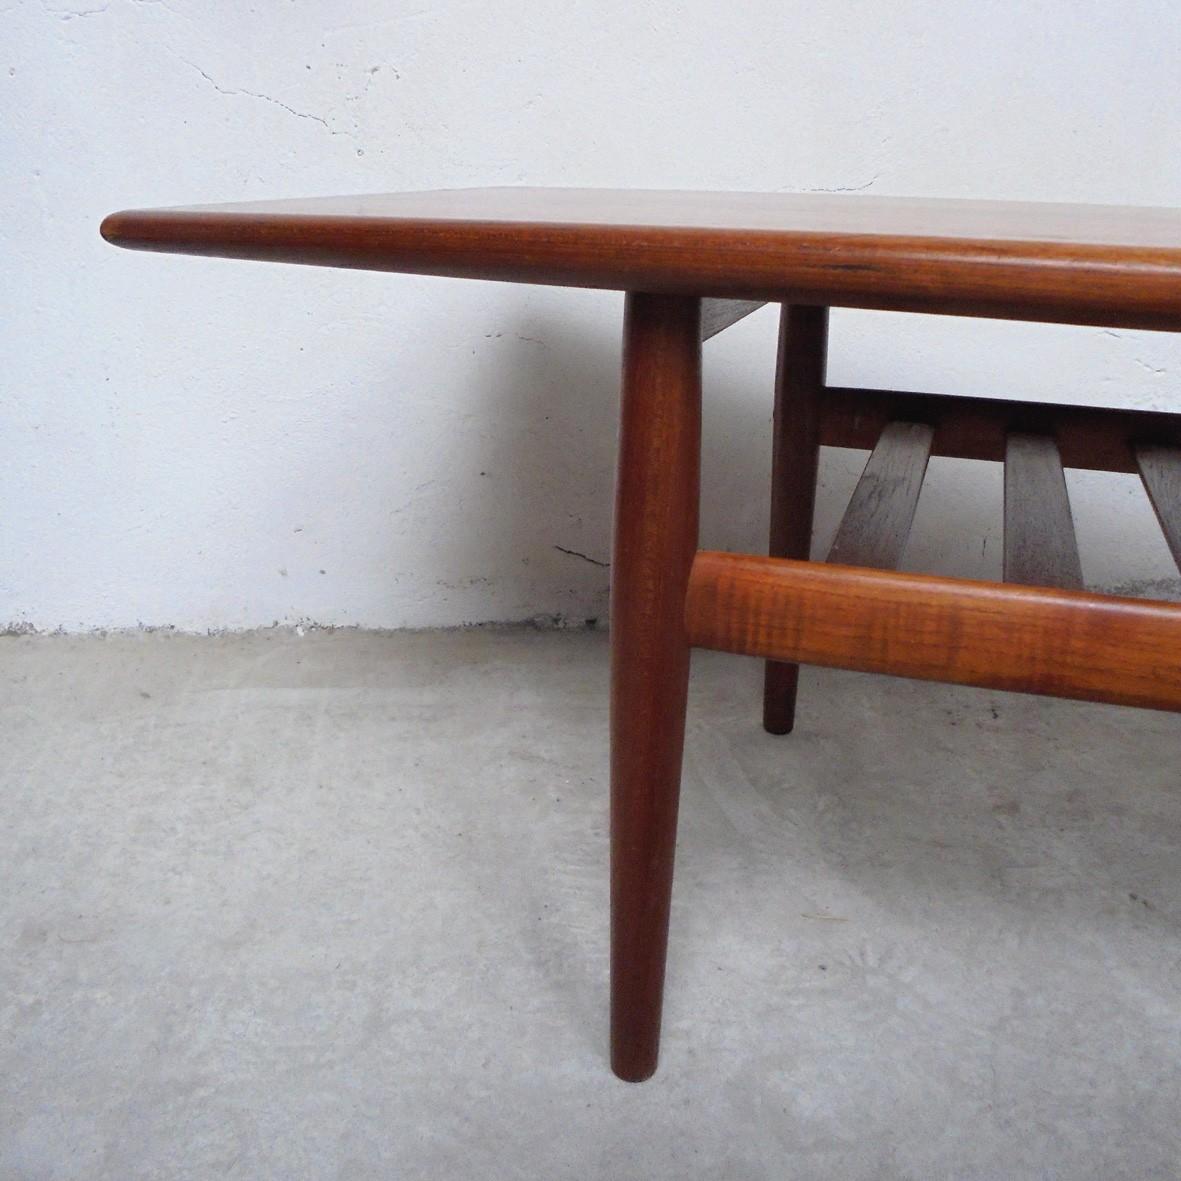 Danish Coffee Table By Grete Jalk 1960s Design Market